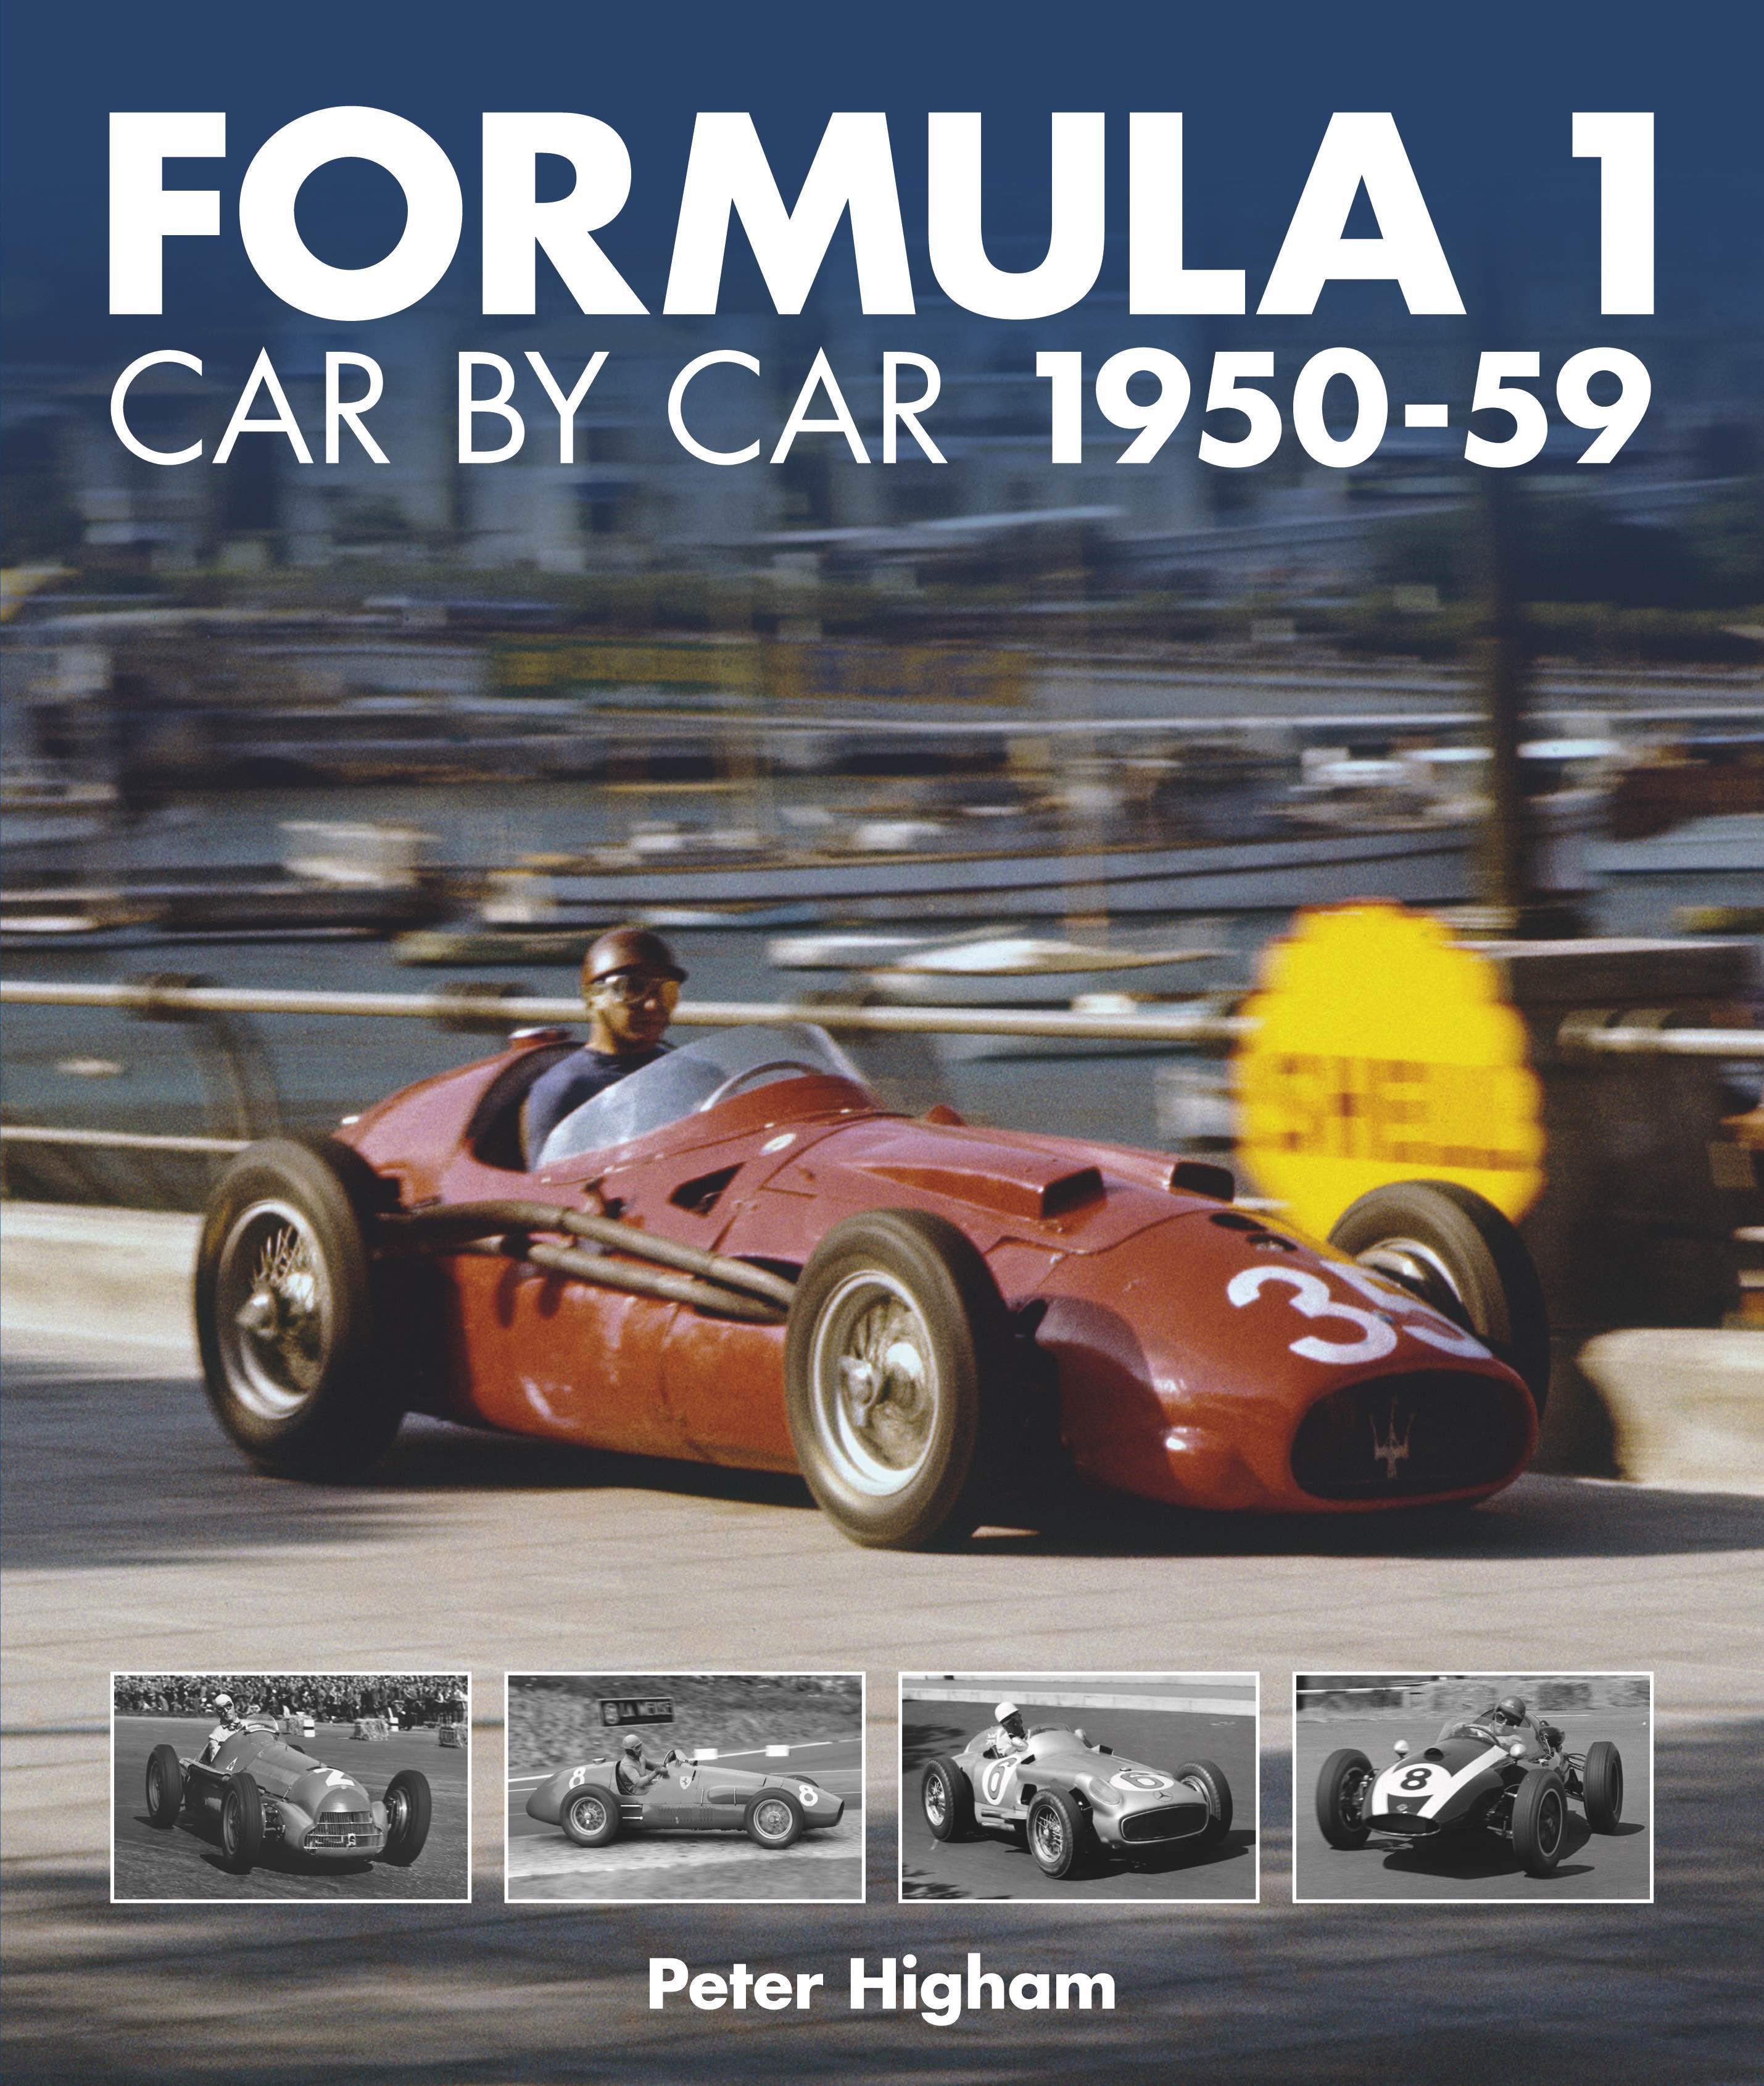 Midweek Motorsport series 15 episode 18